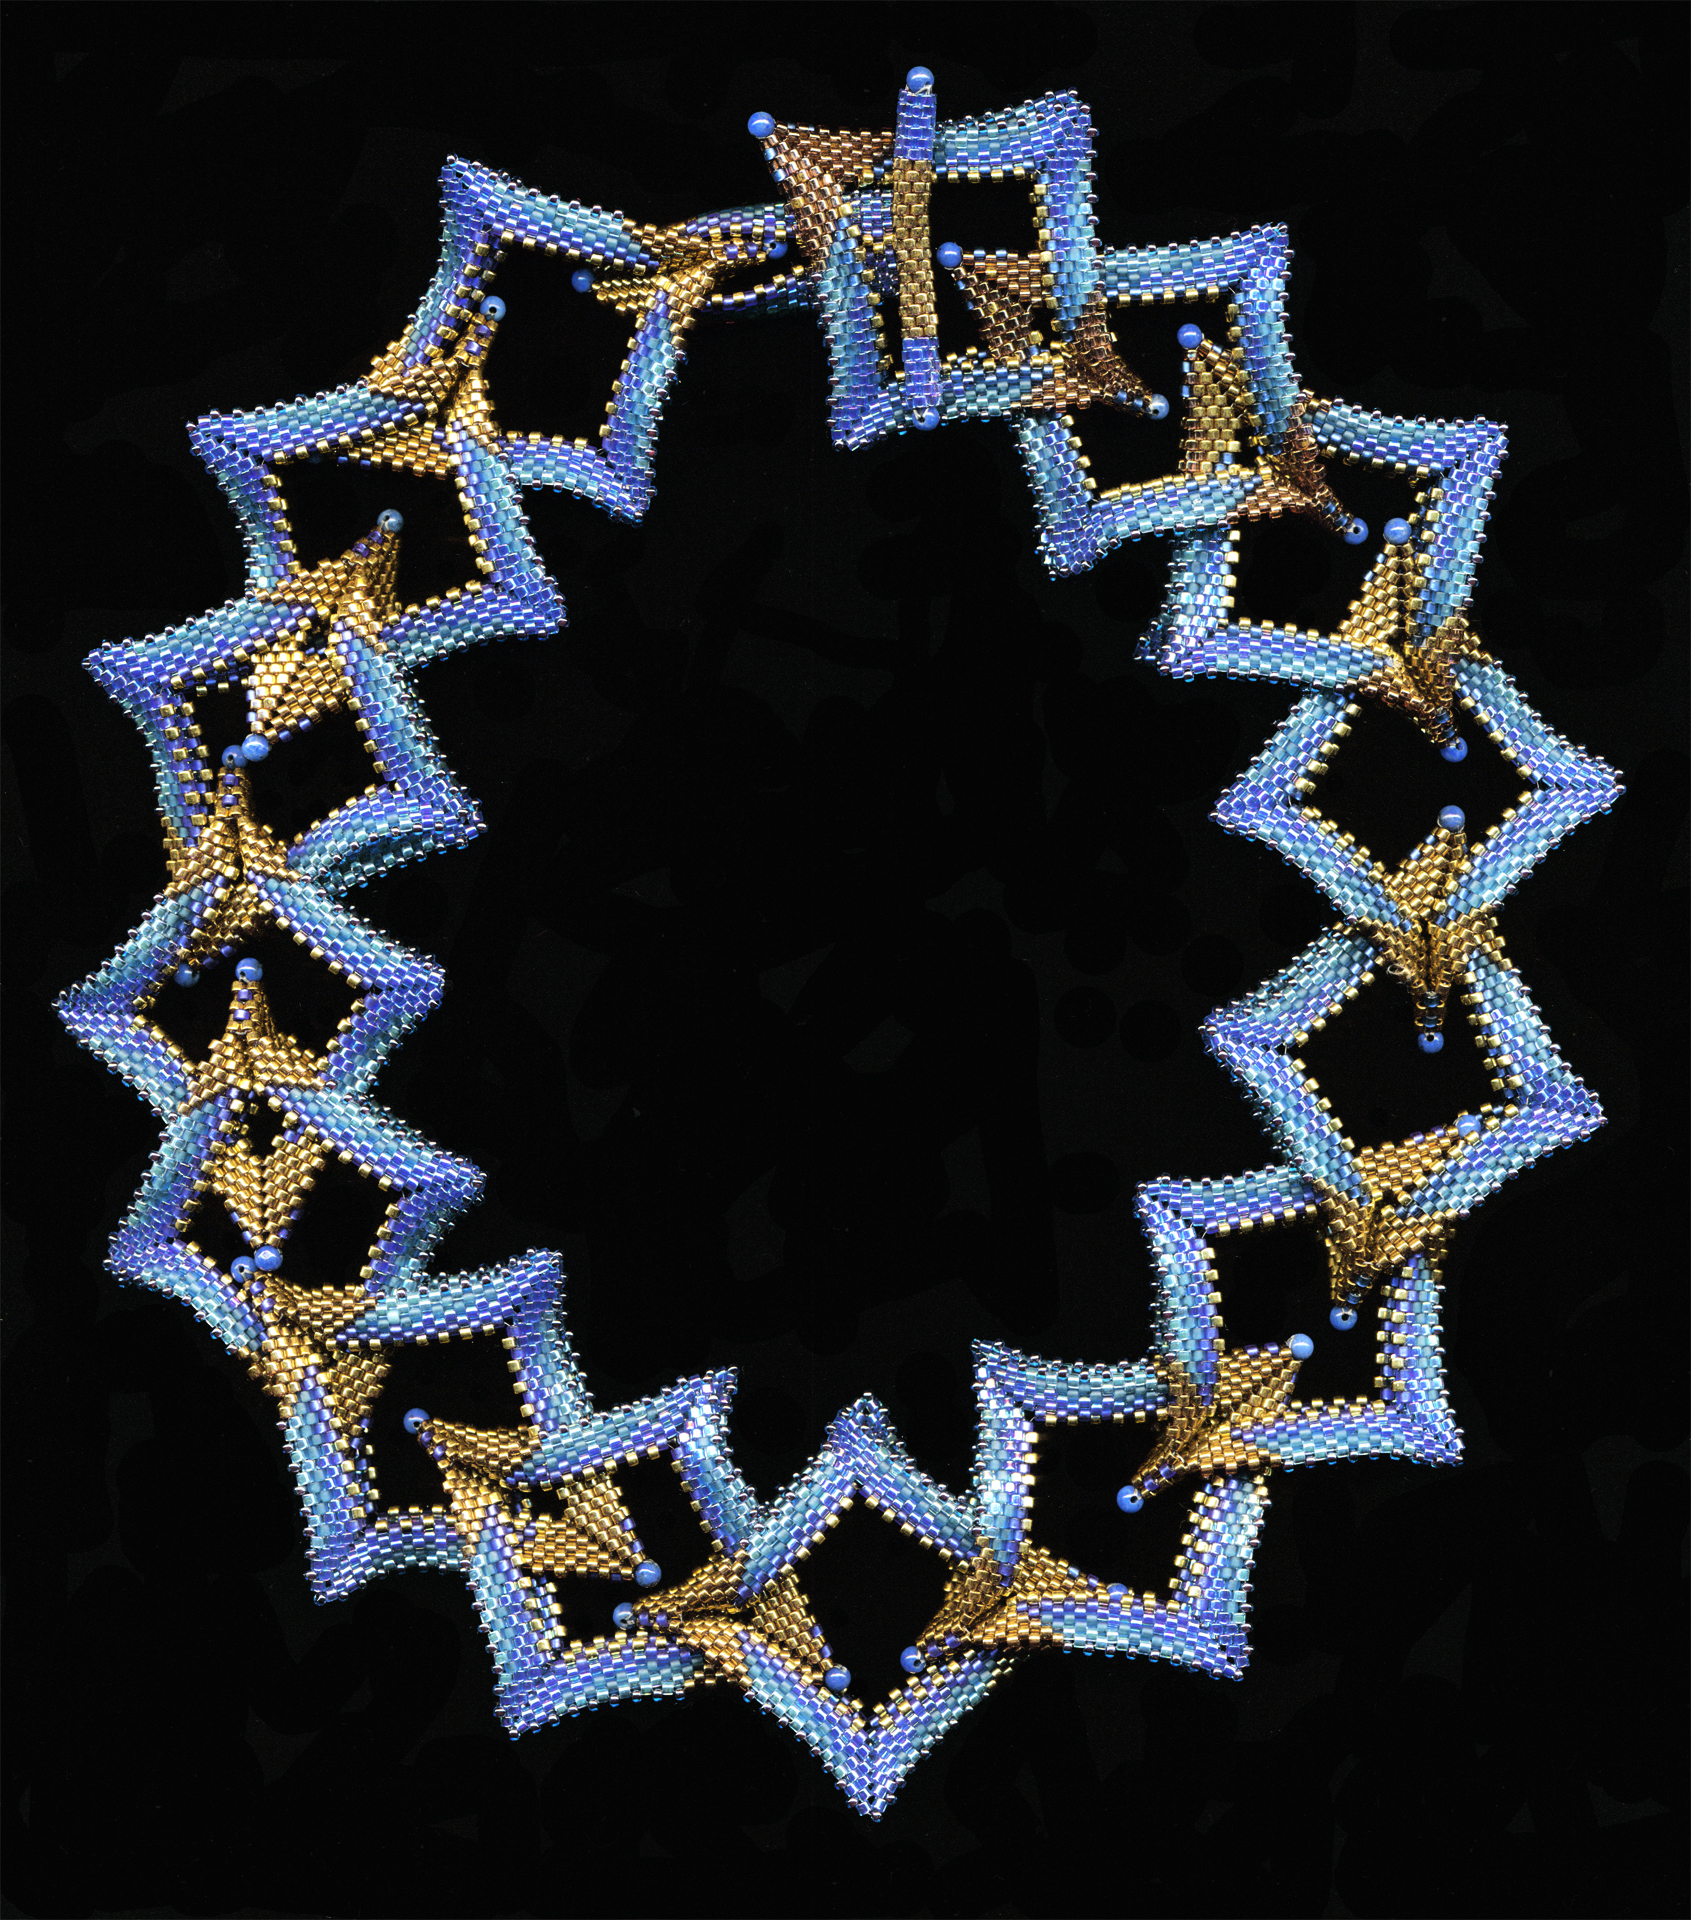 Double Diamond necklace